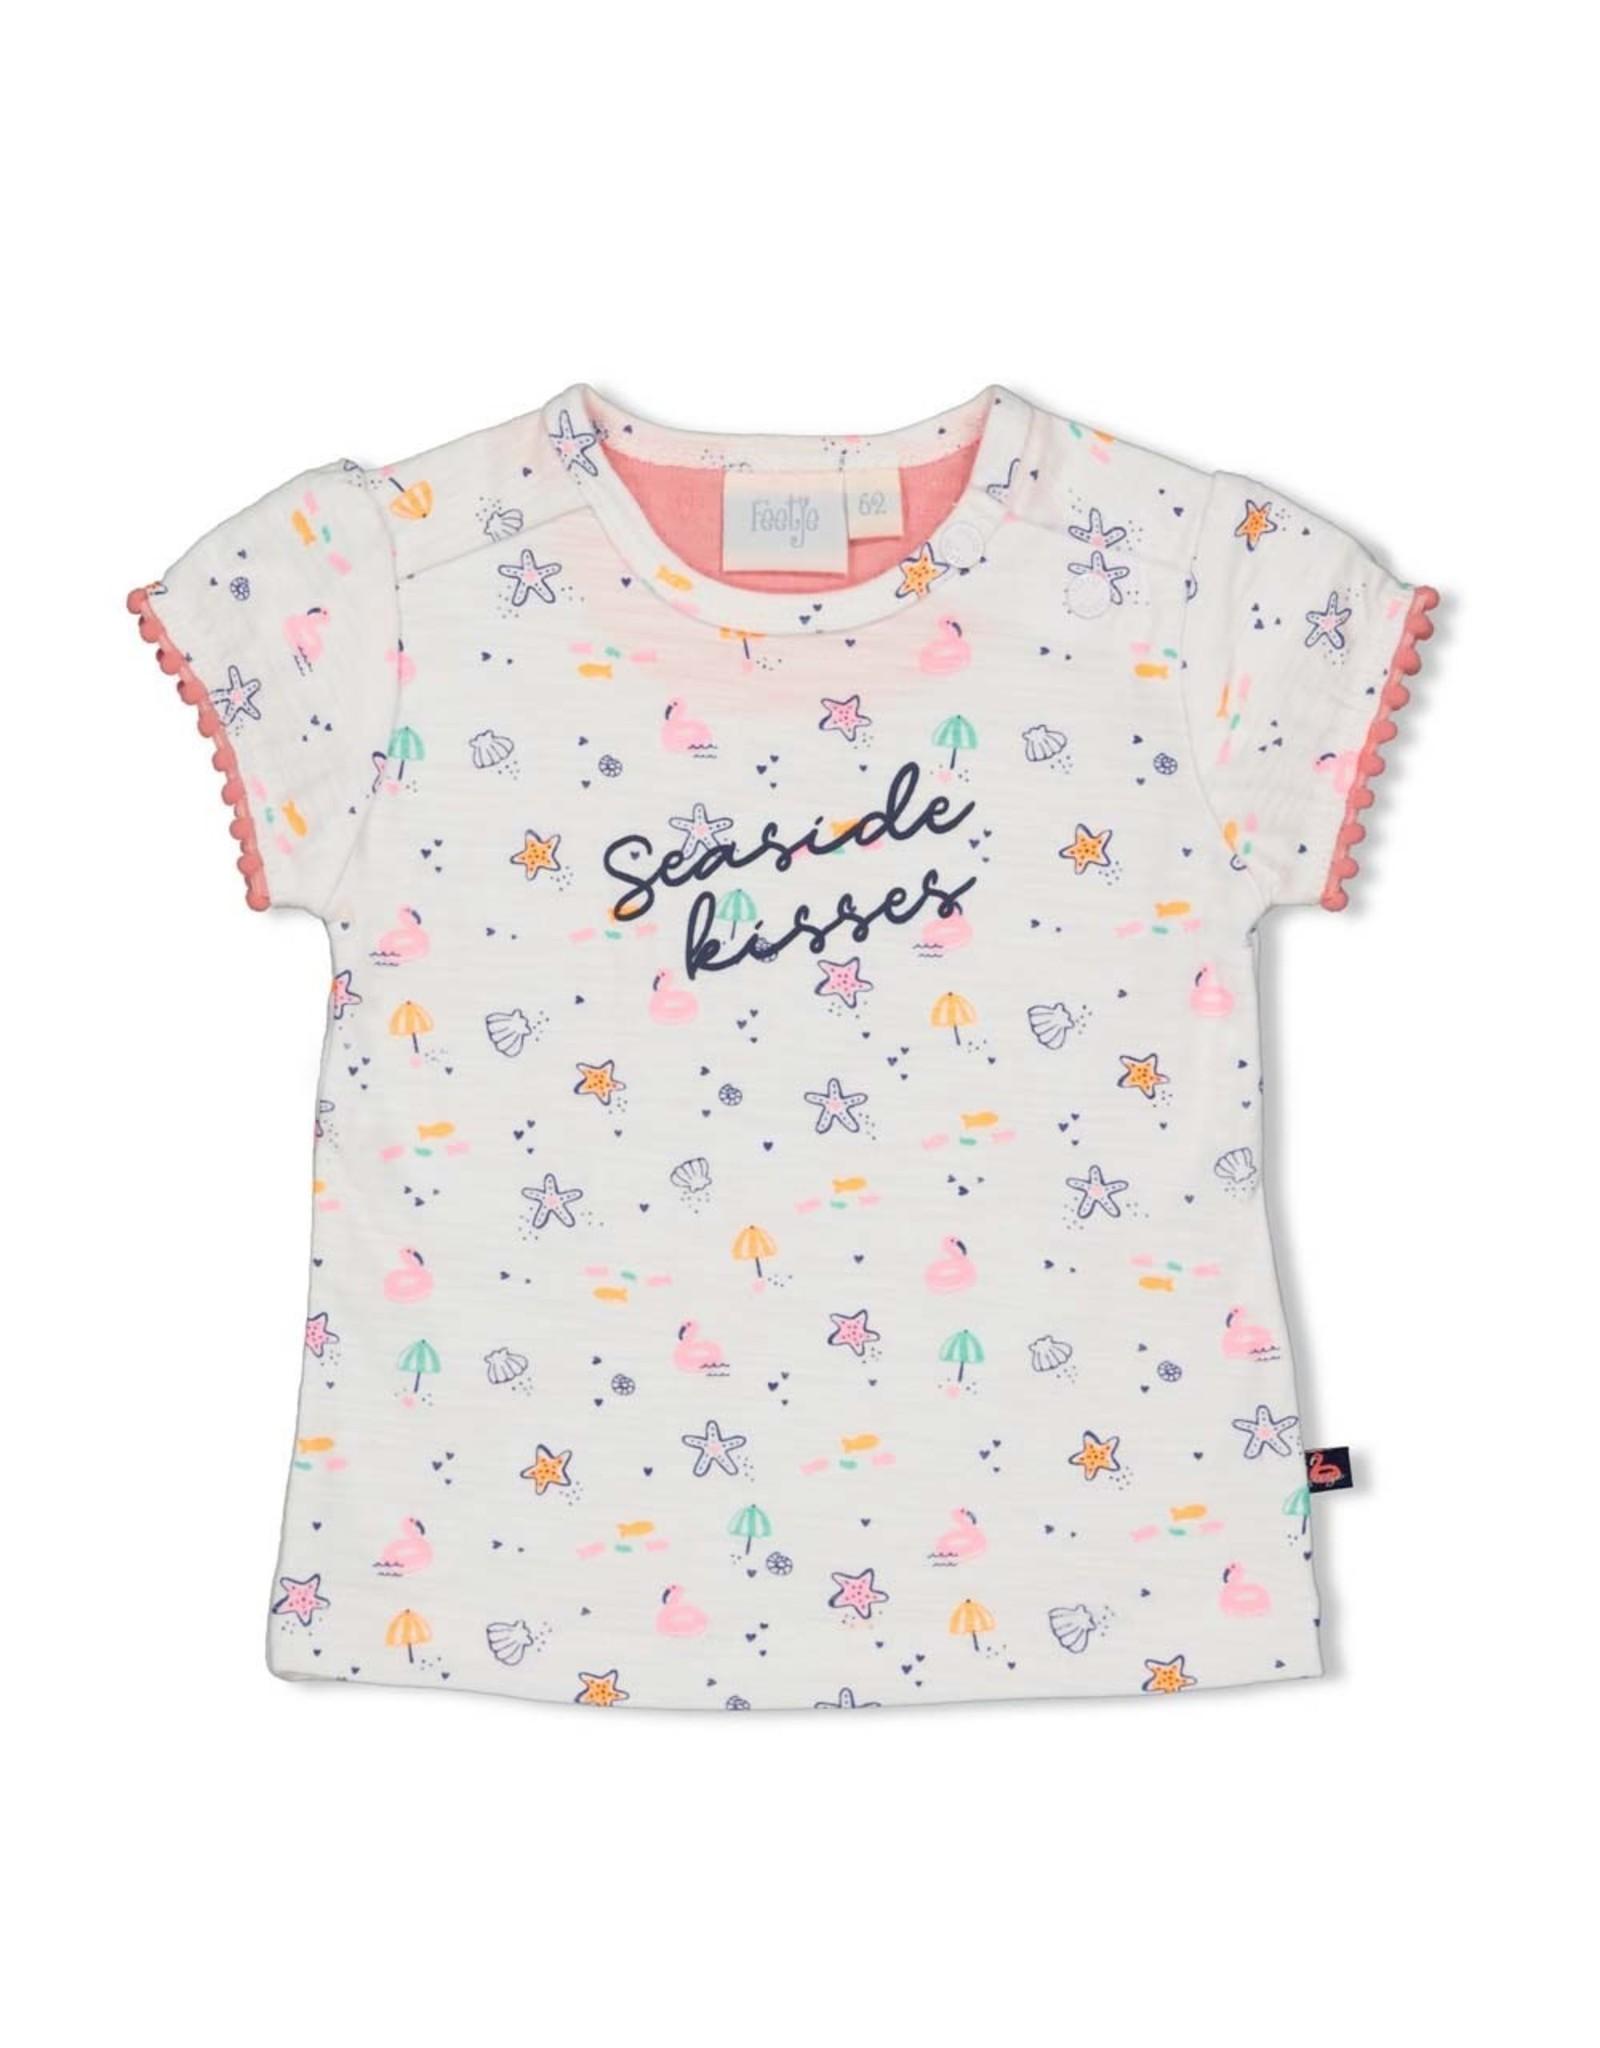 Feetje T-shirt AOP - Seaside Kisses. Wit